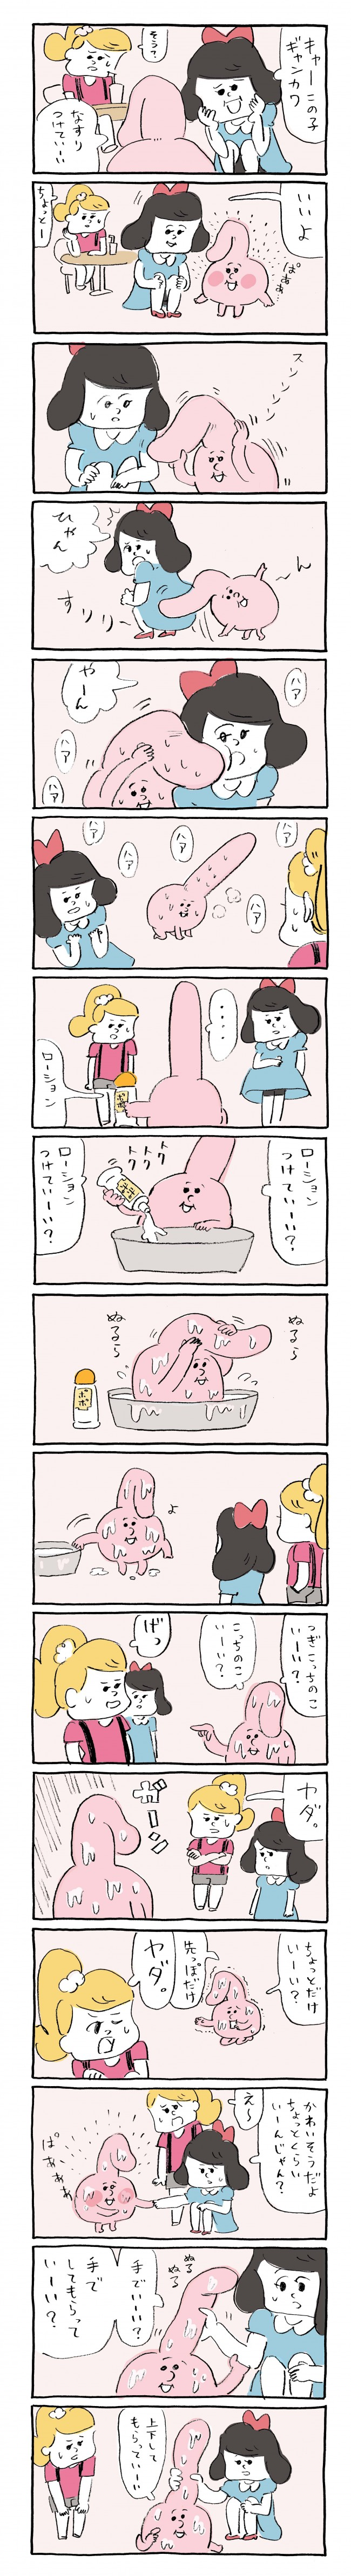 omocoro_manga_2